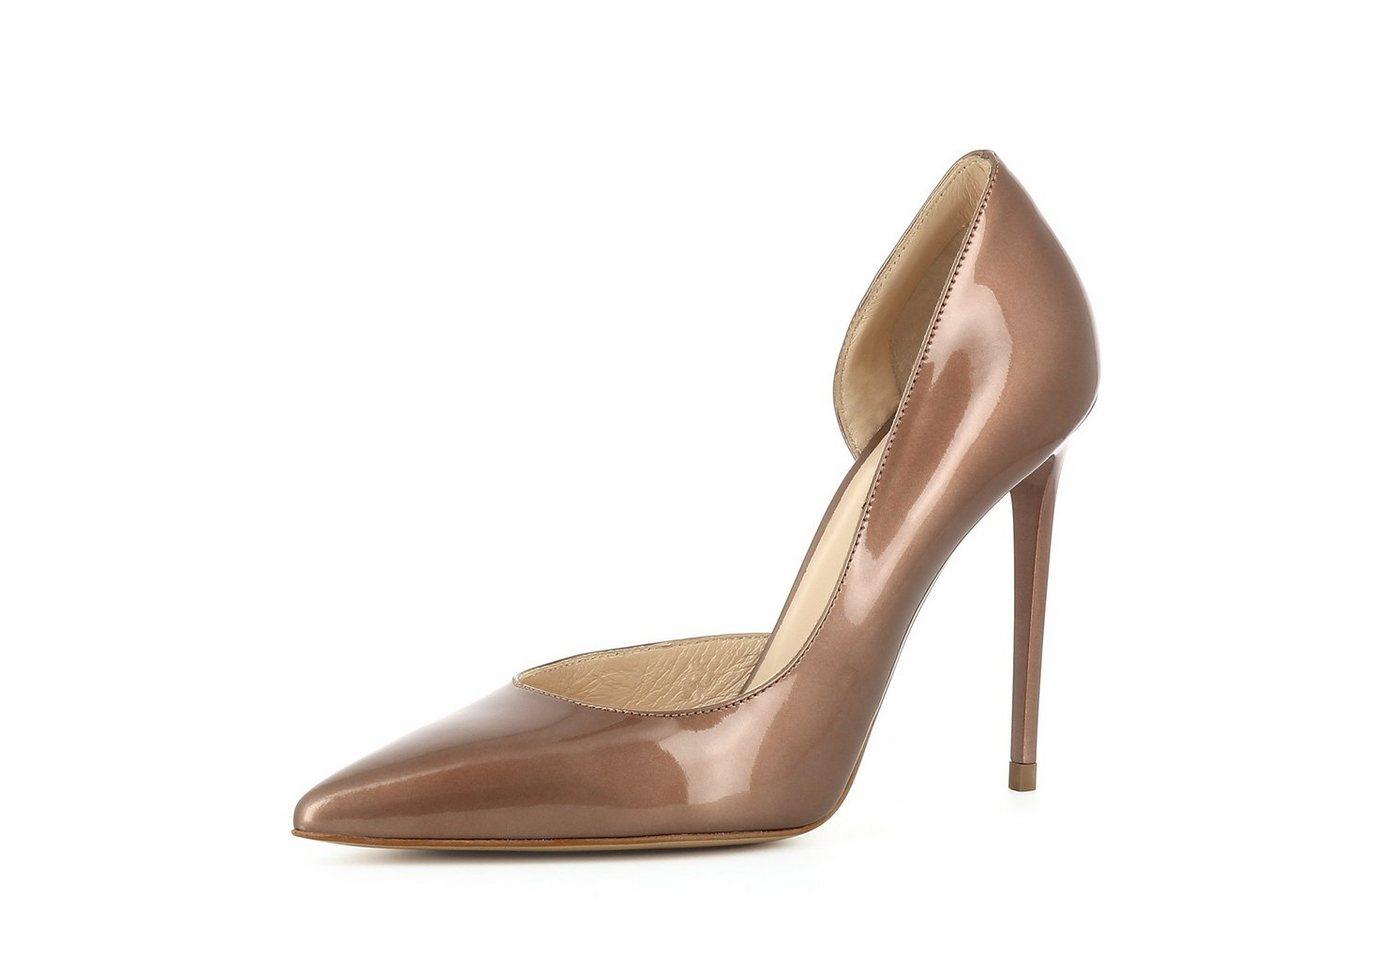 Evita »ALINA« High-Heel-Pumps | Schuhe > High Heels | Gelb | Evita